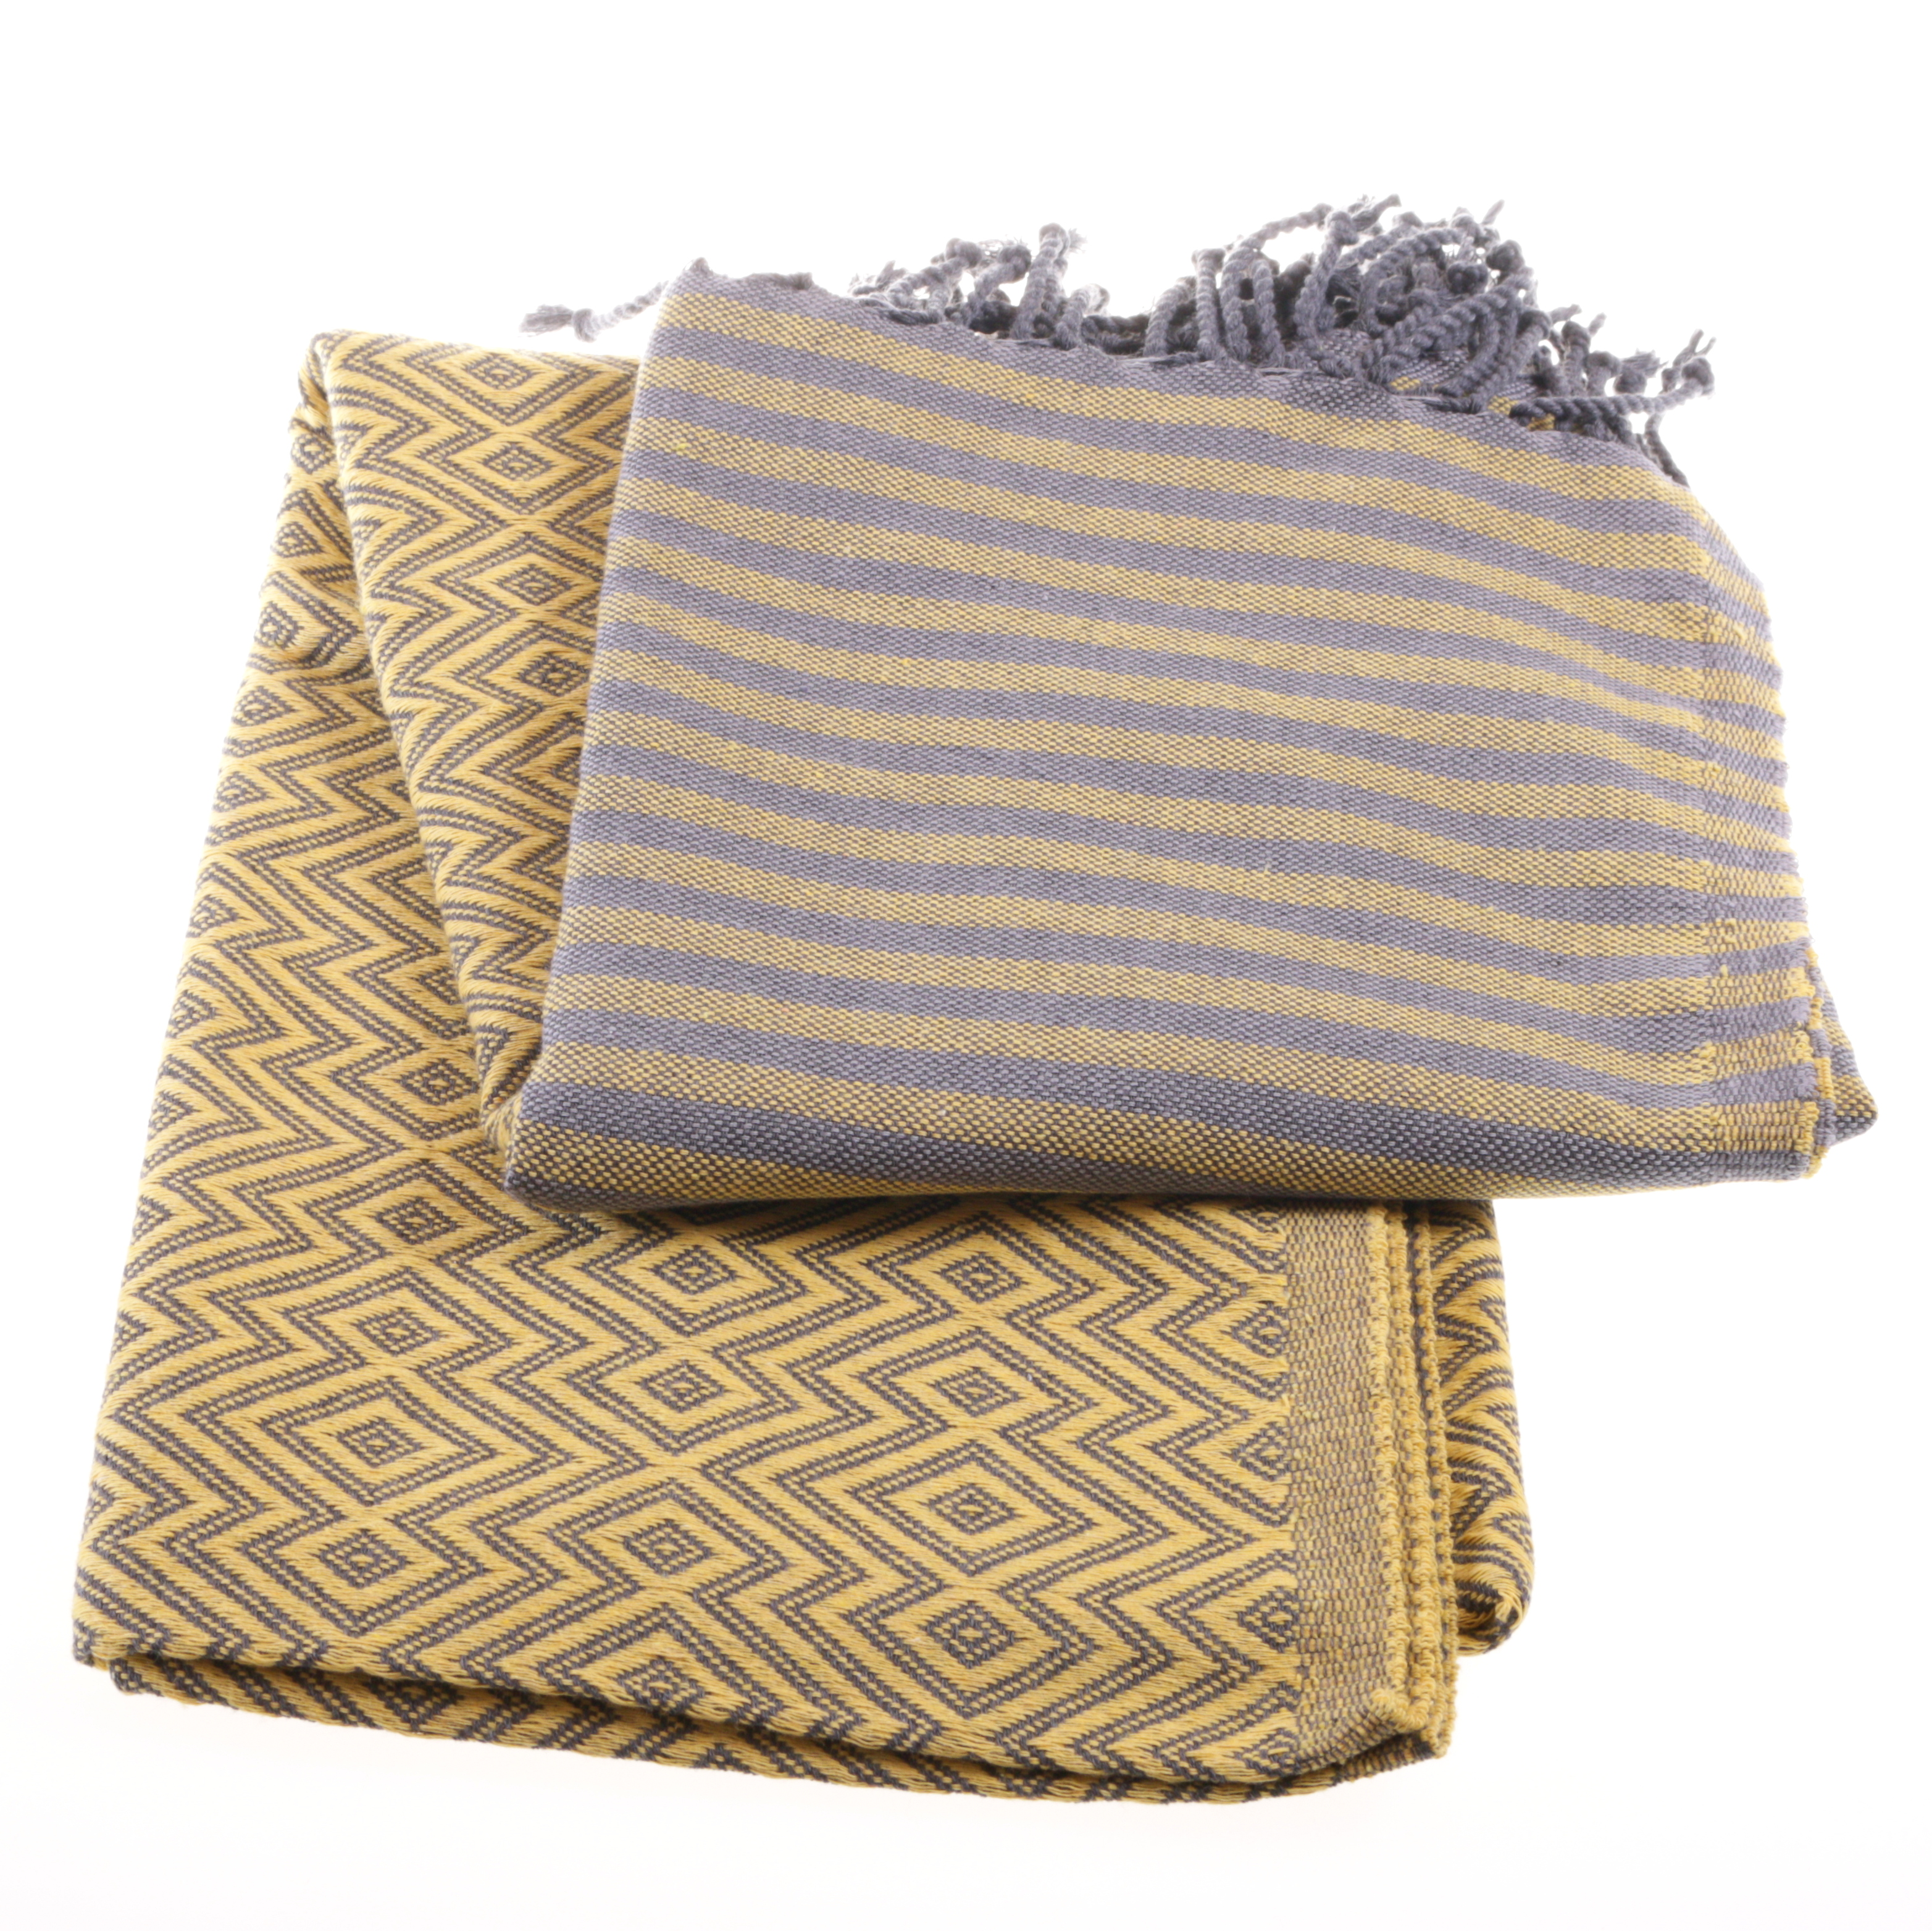 hammam towel killim style yellow and grey